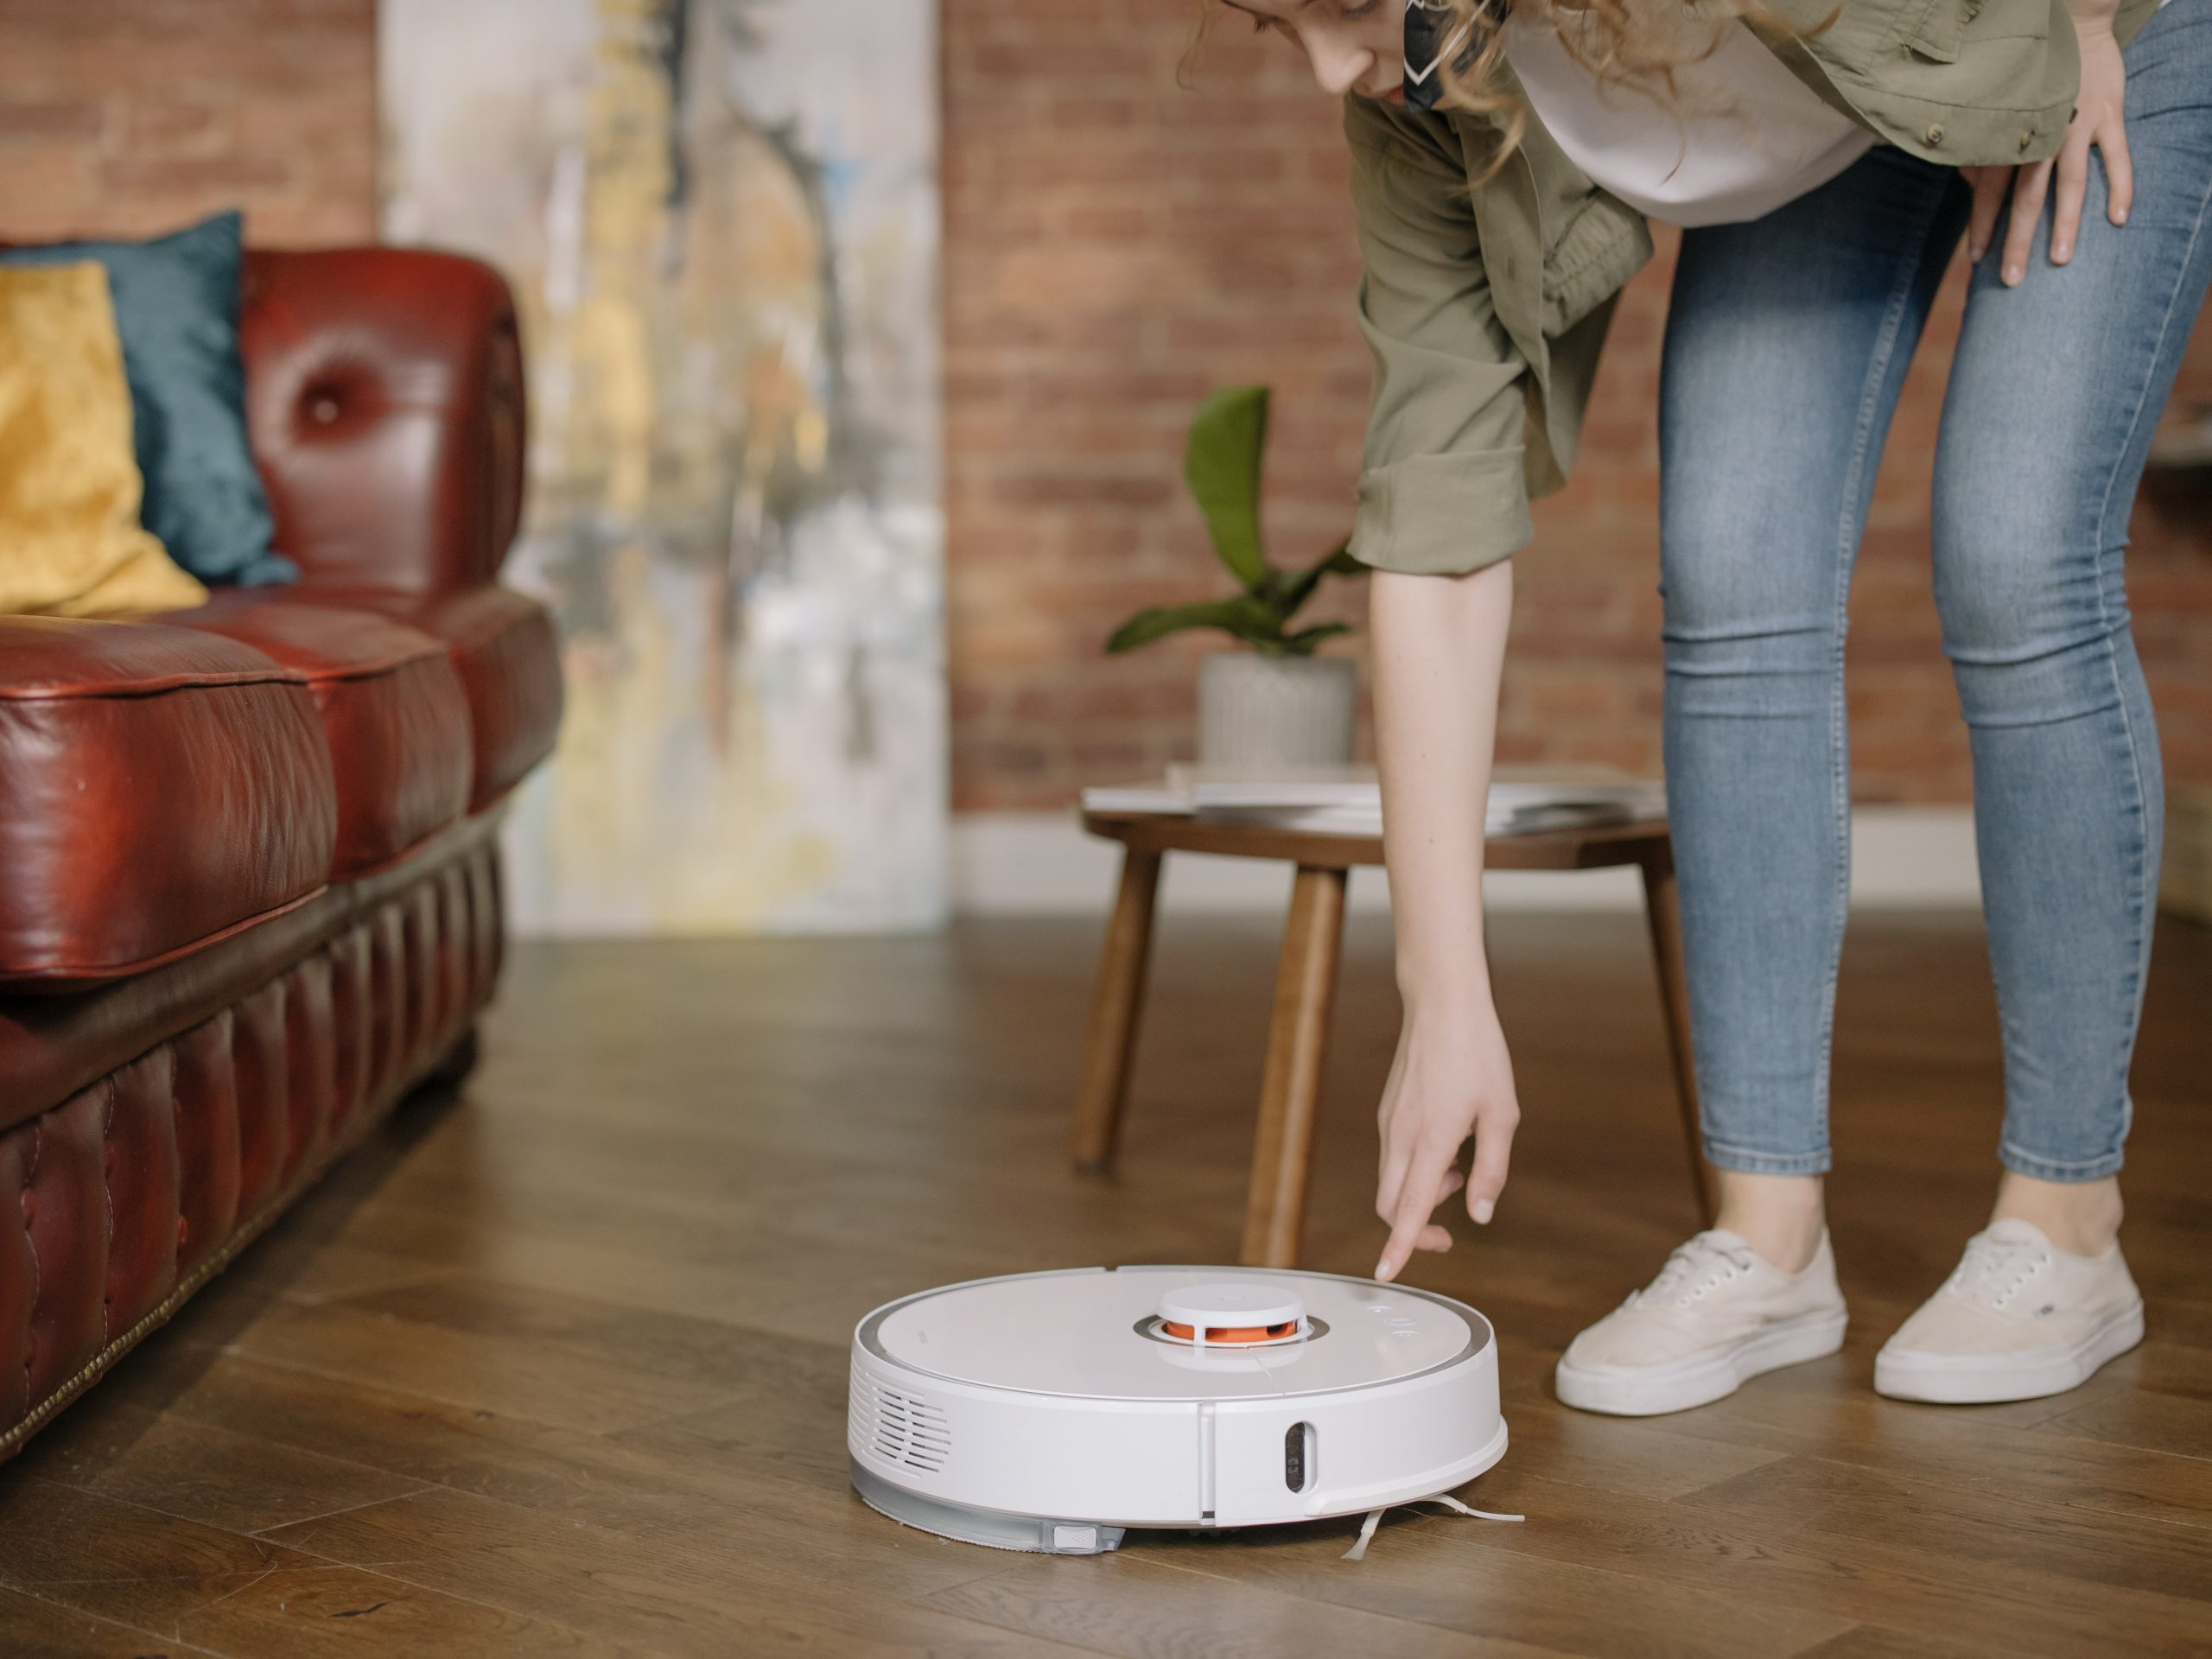 woman using a robot vacuum